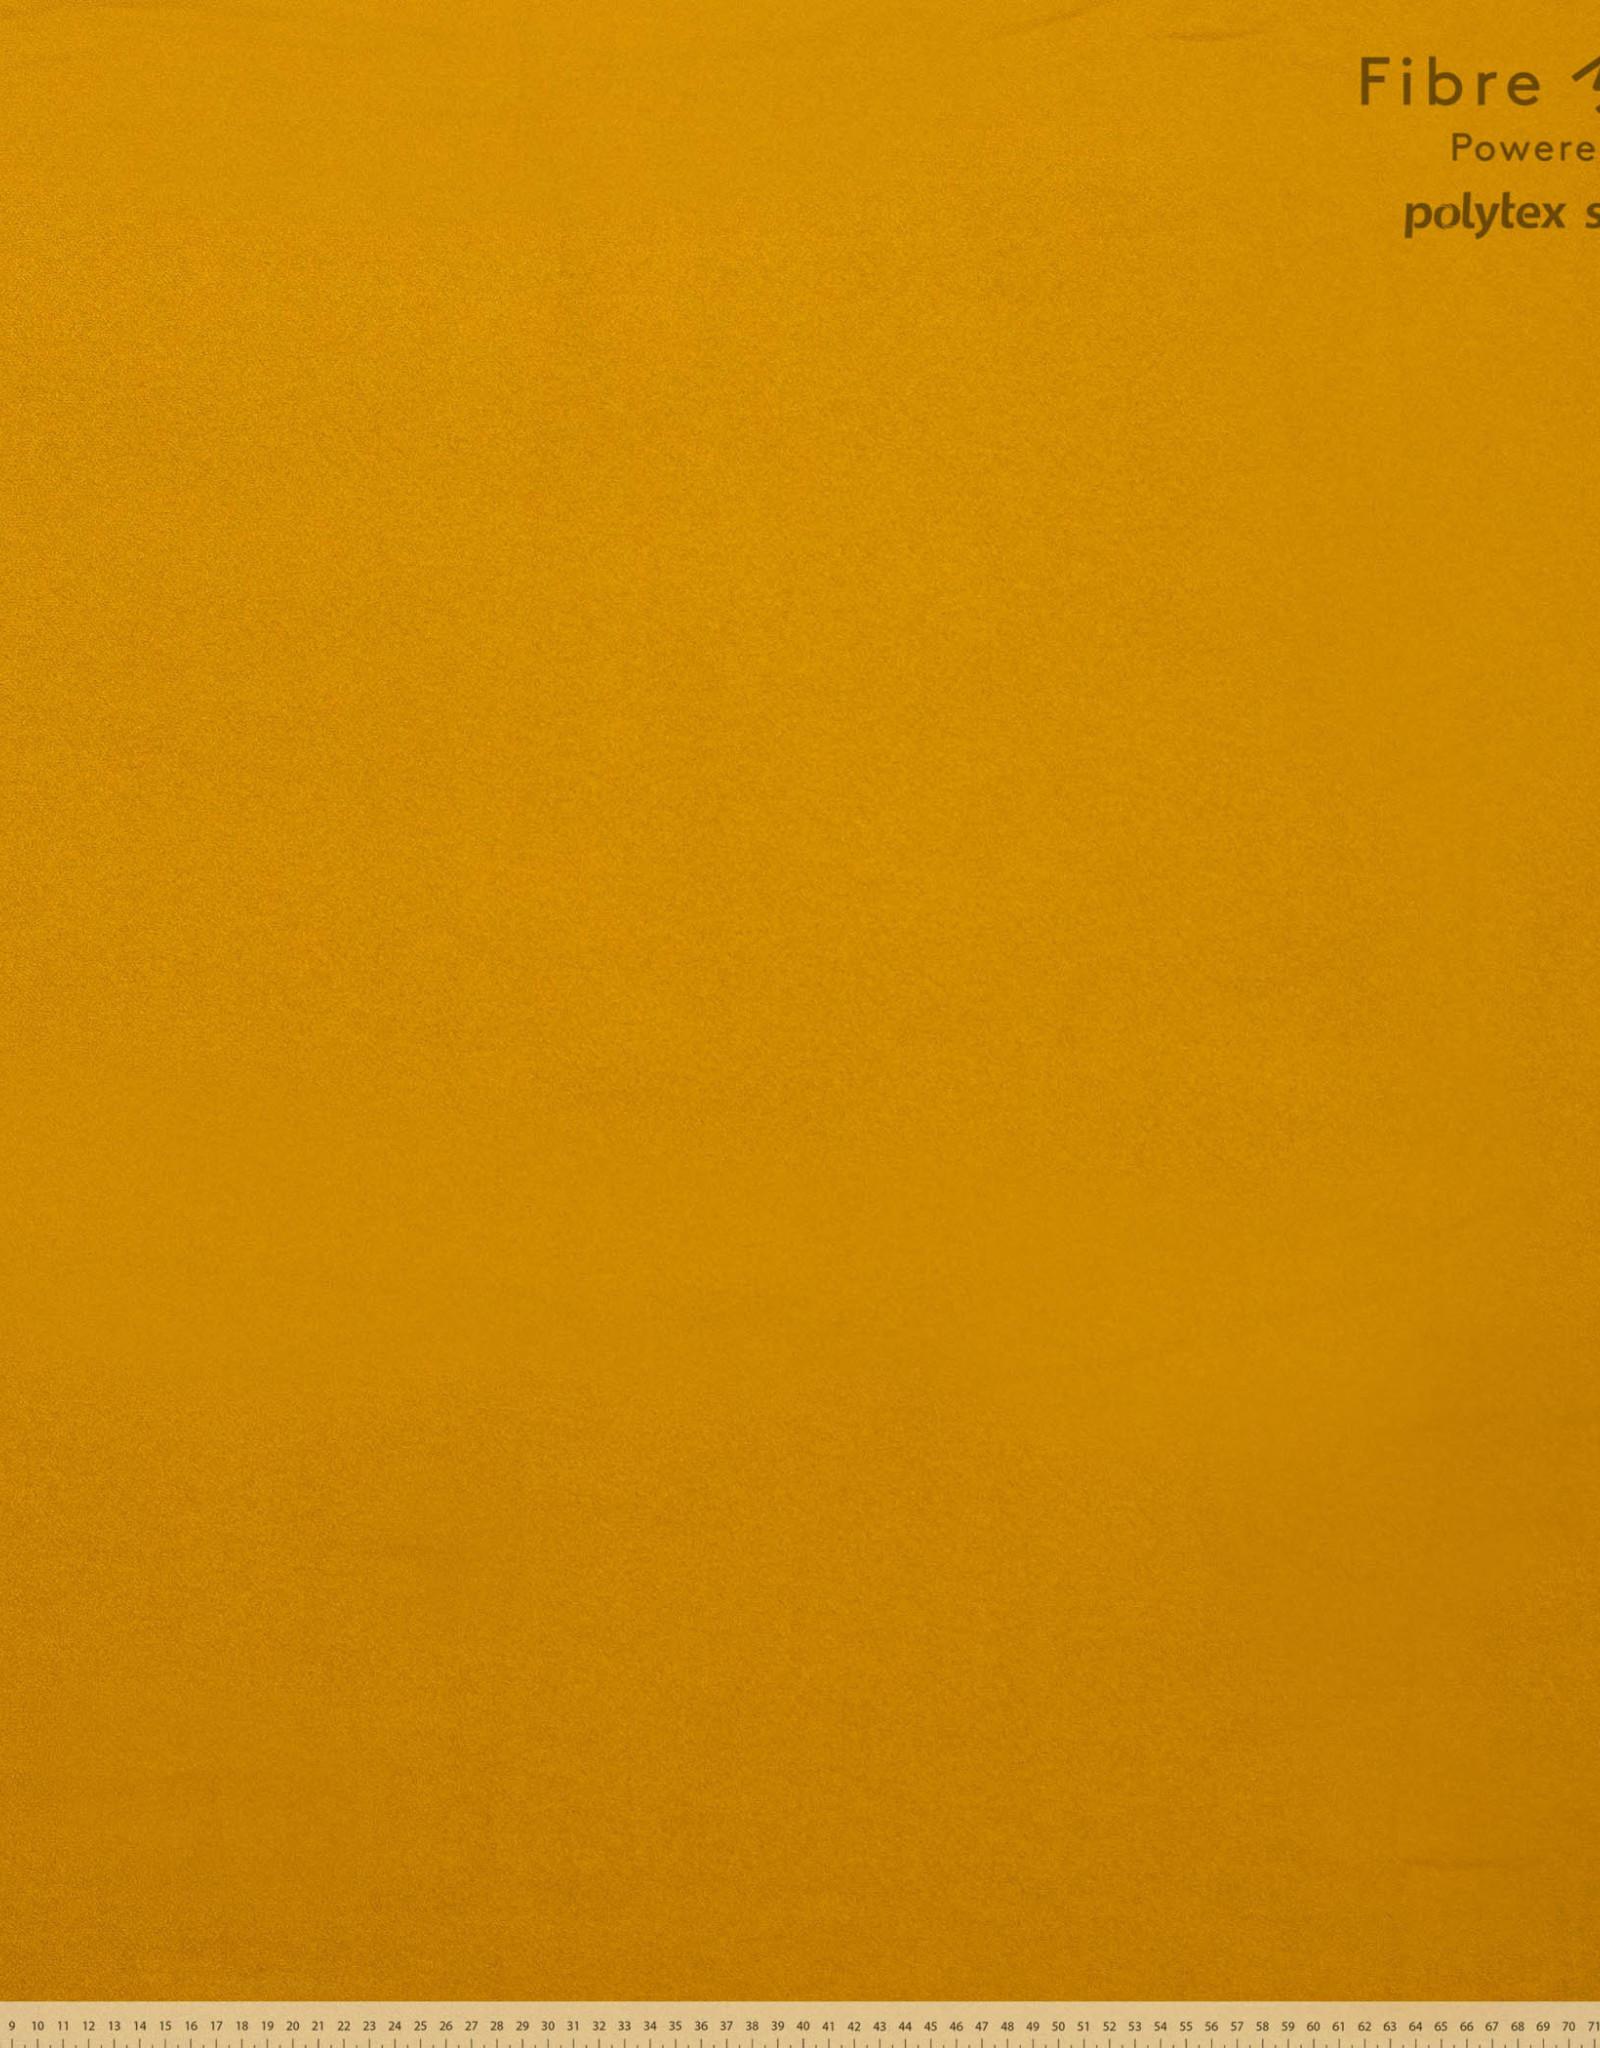 Fibre Mood Fibre Mood editie 15 viscose crepe golden price (Vikki)